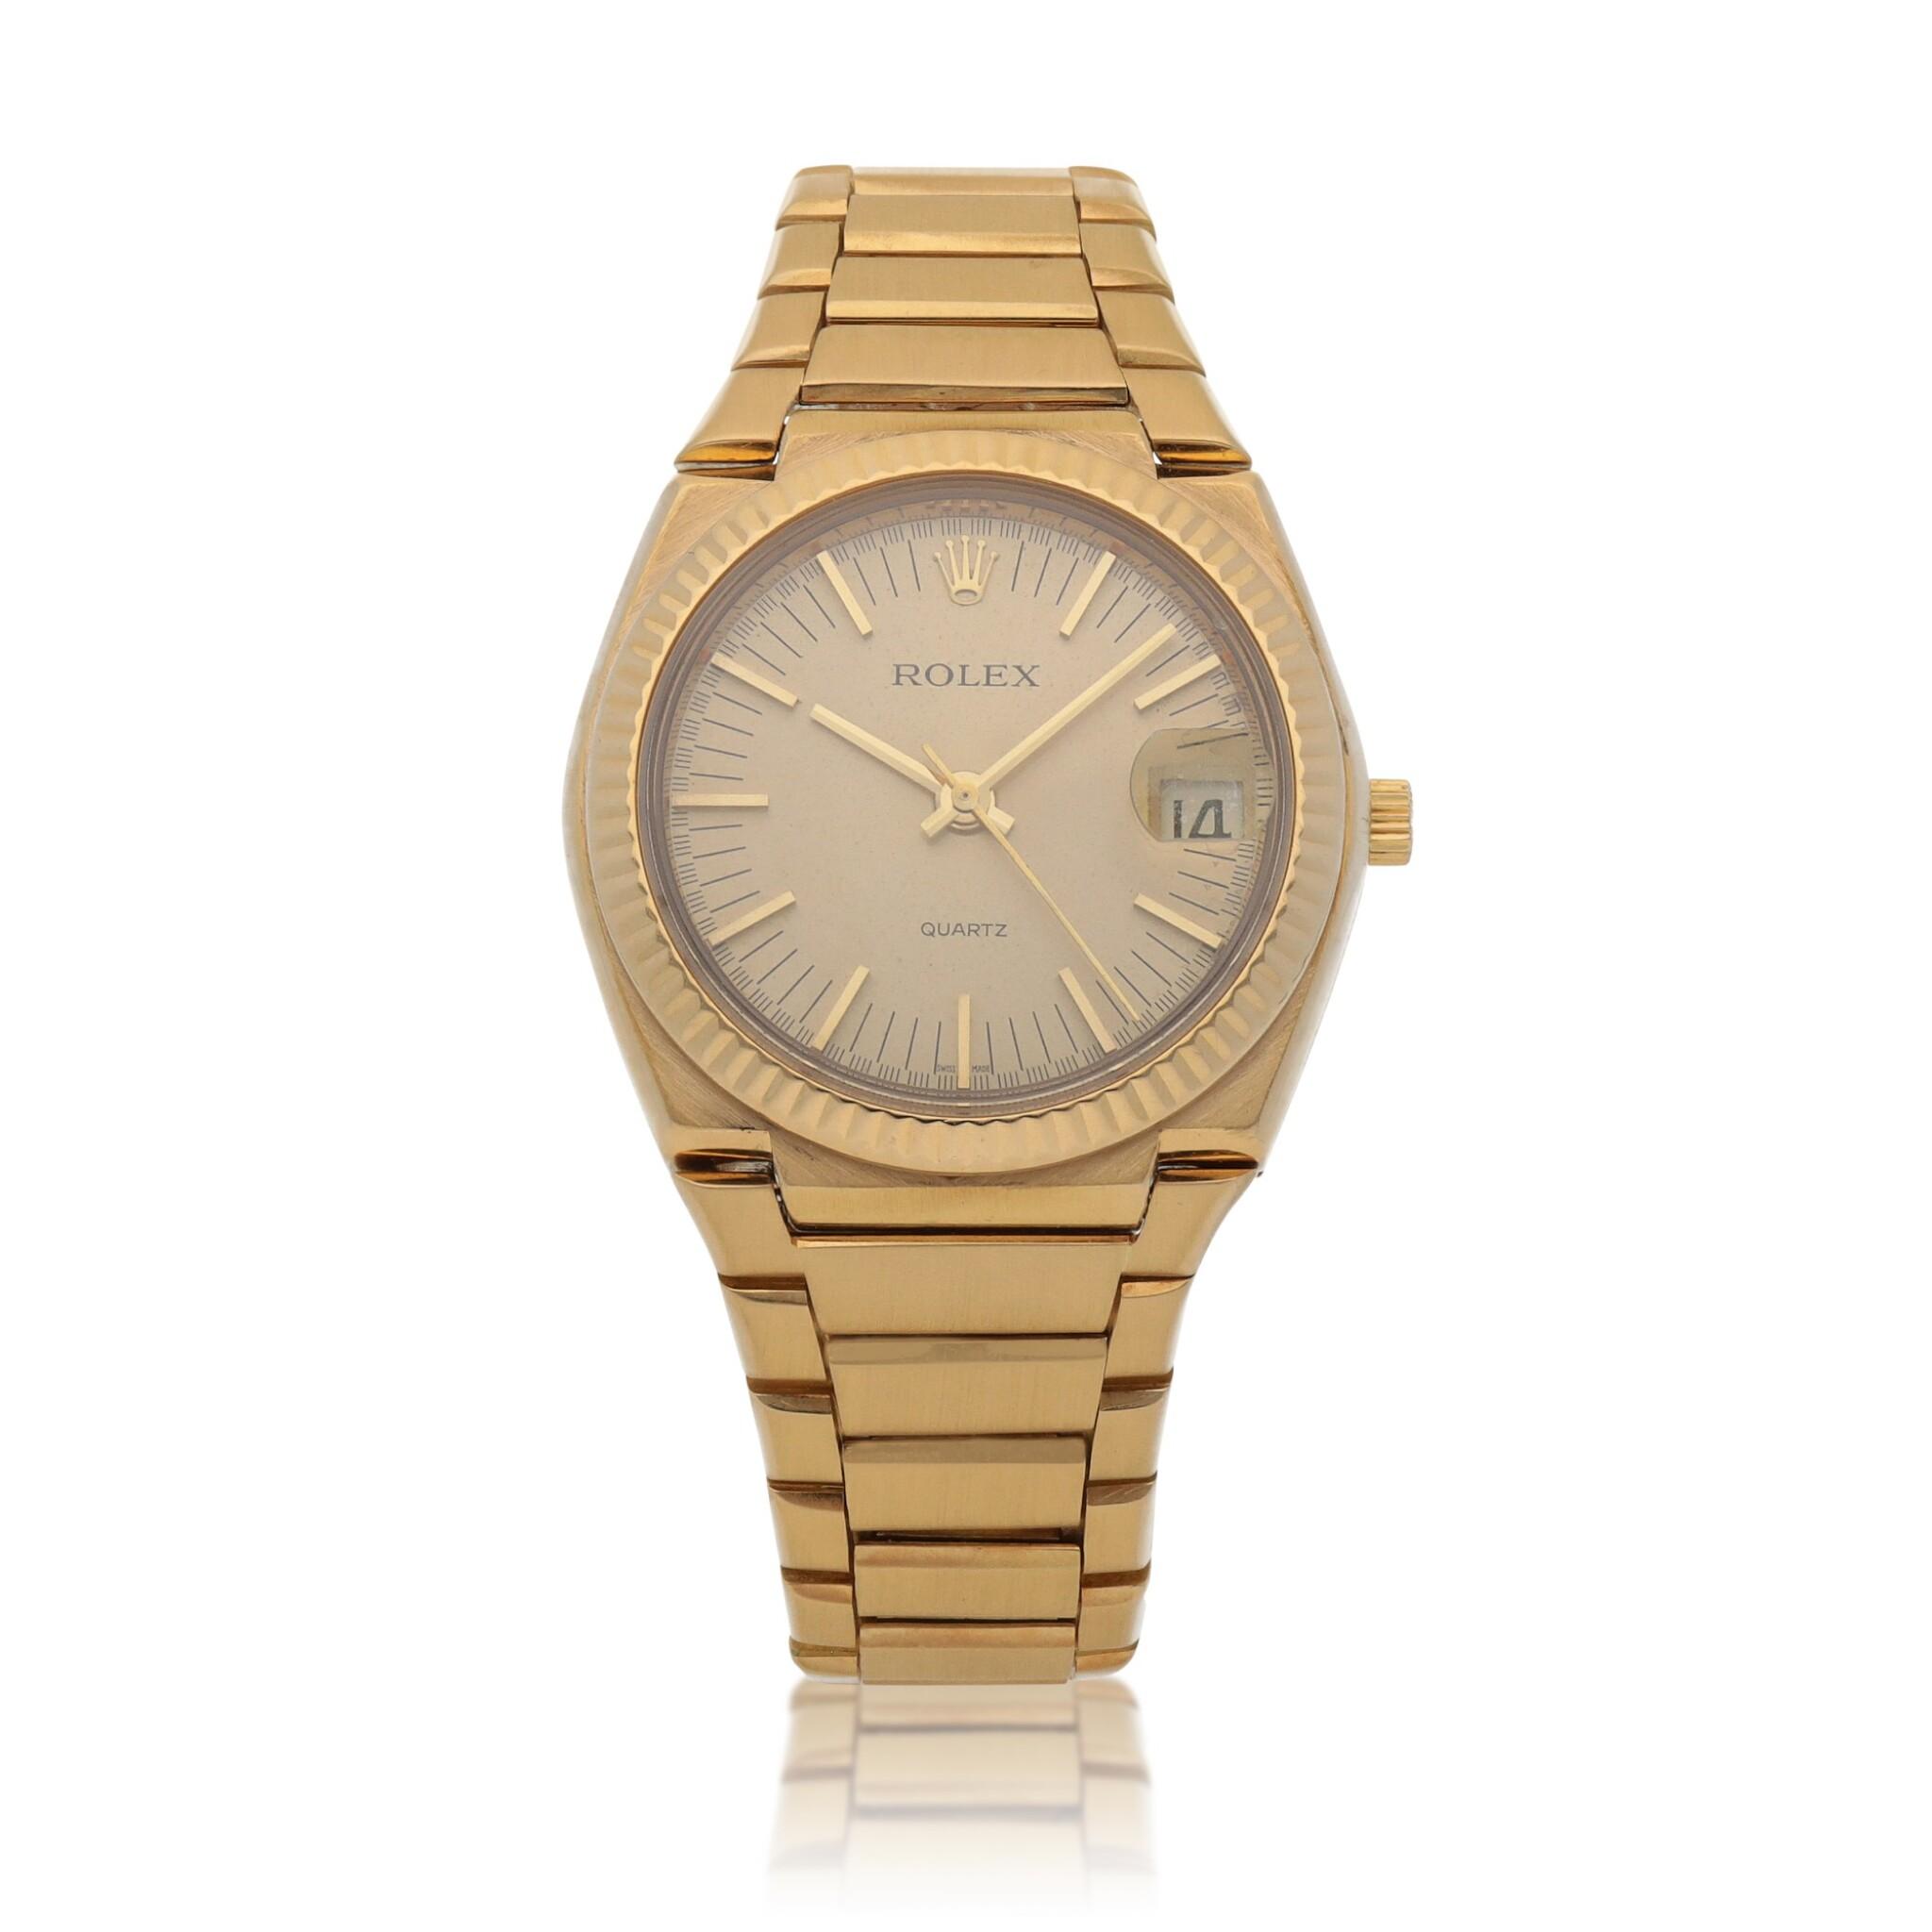 View full screen - View 1 of Lot 428. 'The Texan' Quartz, Ref. 5100 BETA 21 Yellow gold wristwatch with date and bracelet Circa 1970 | 勞力士 5100 BETA 21型號「'The Texan' Quartz」黃金鍊帶腕錶備日期顯示,年份約1970.